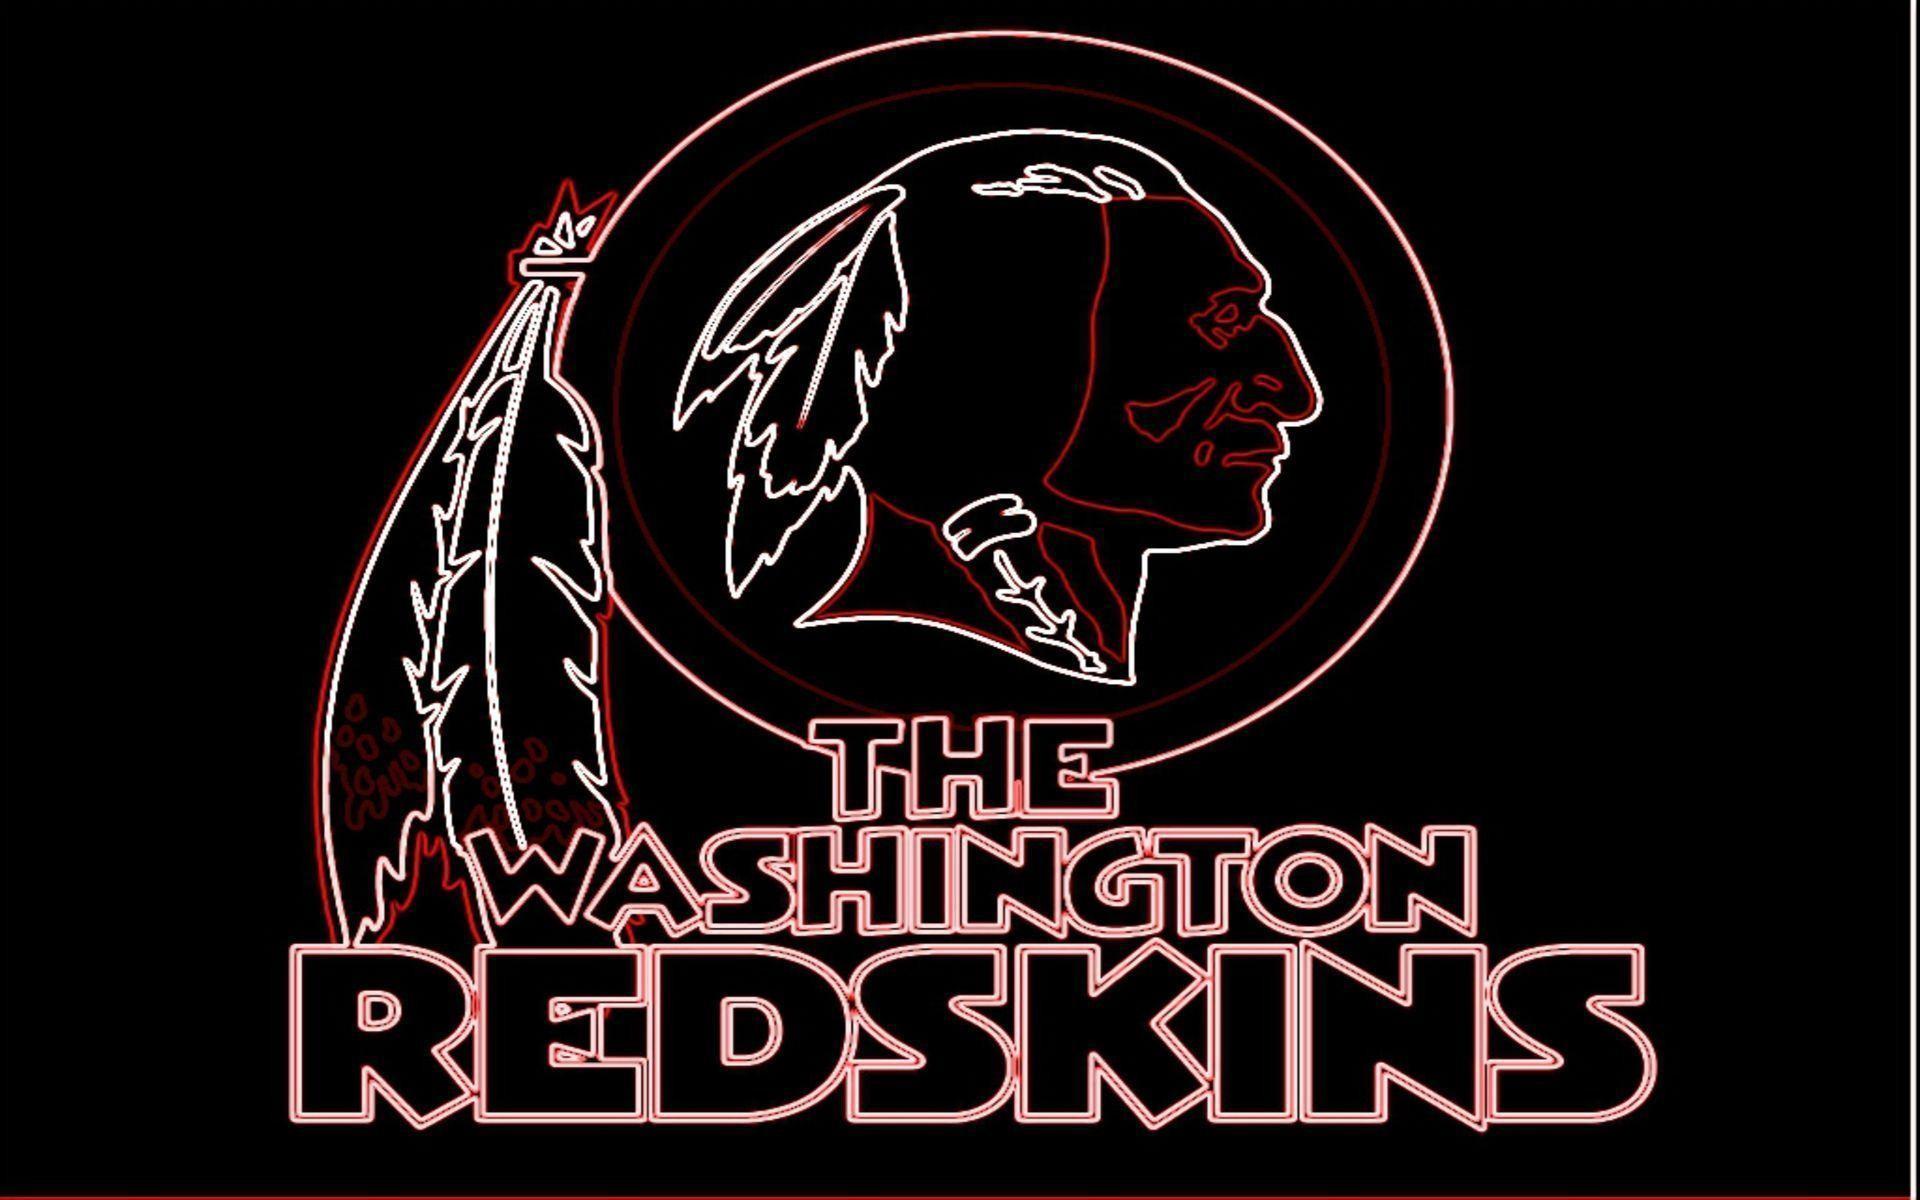 Washington Redskins Wallpaper 6 | Chainimage